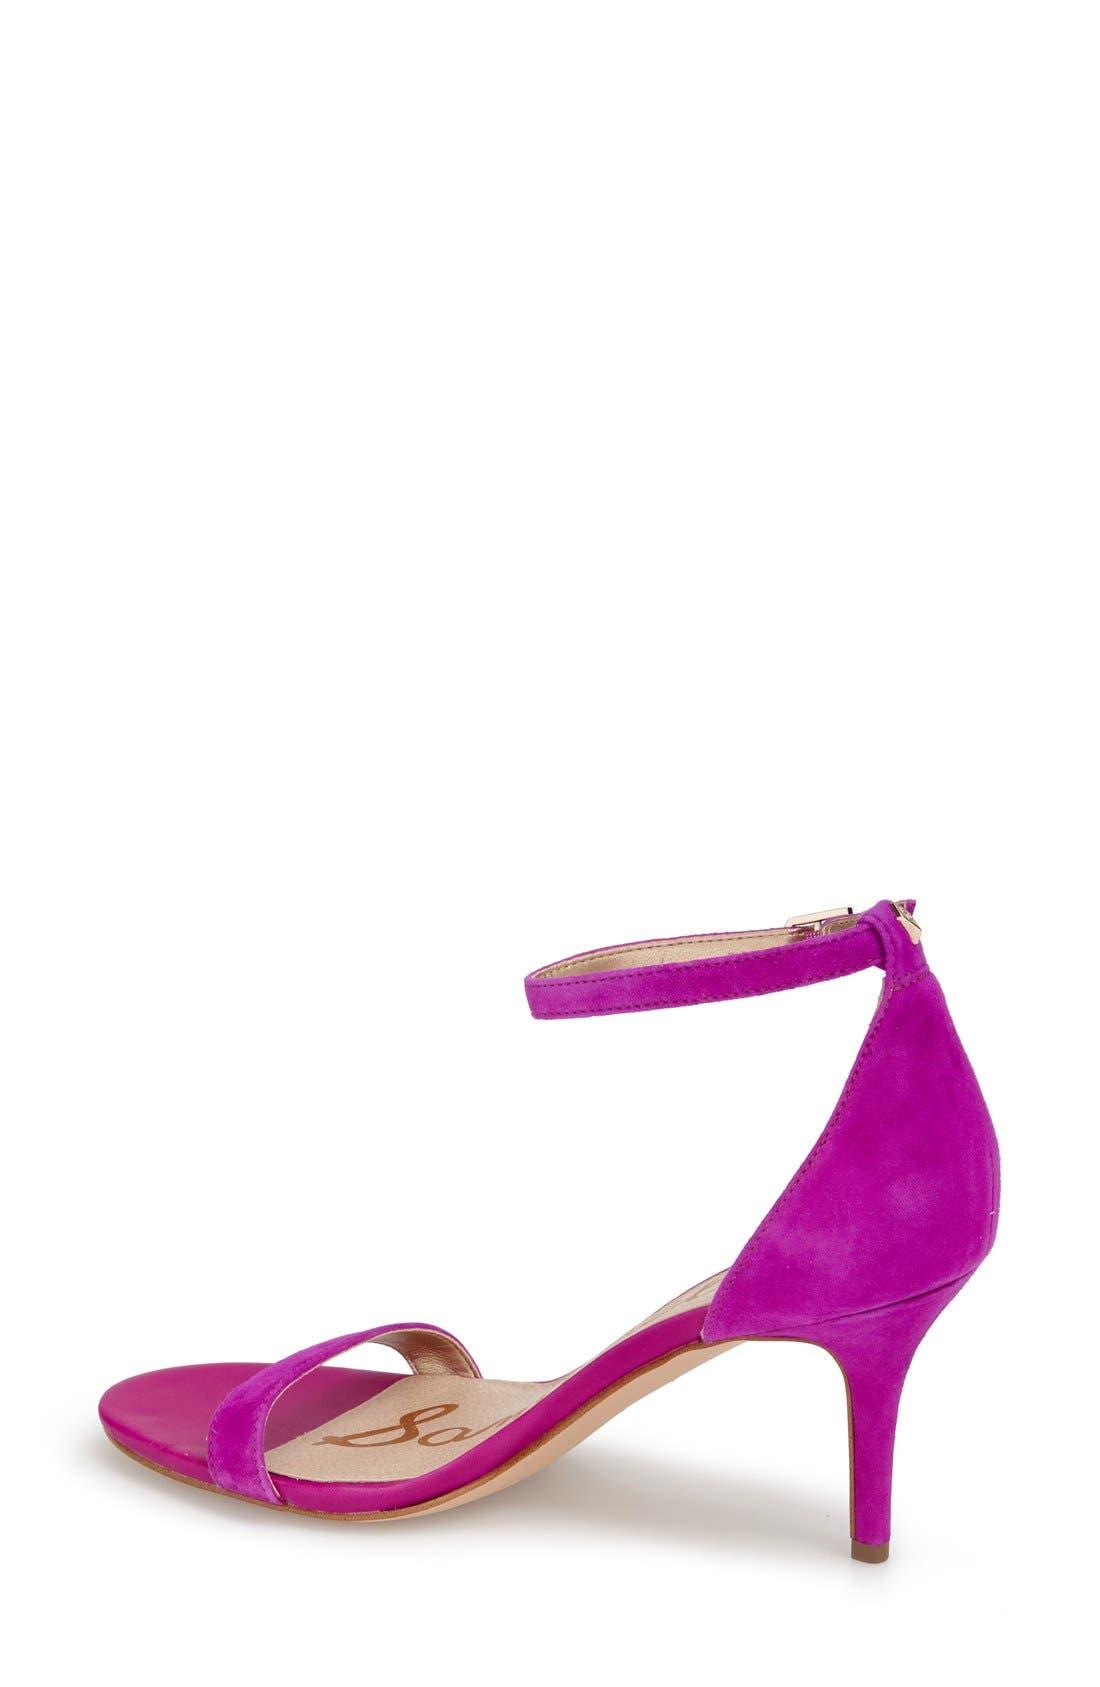 ,                             'Patti' Ankle Strap Sandal,                             Alternate thumbnail 205, color,                             651